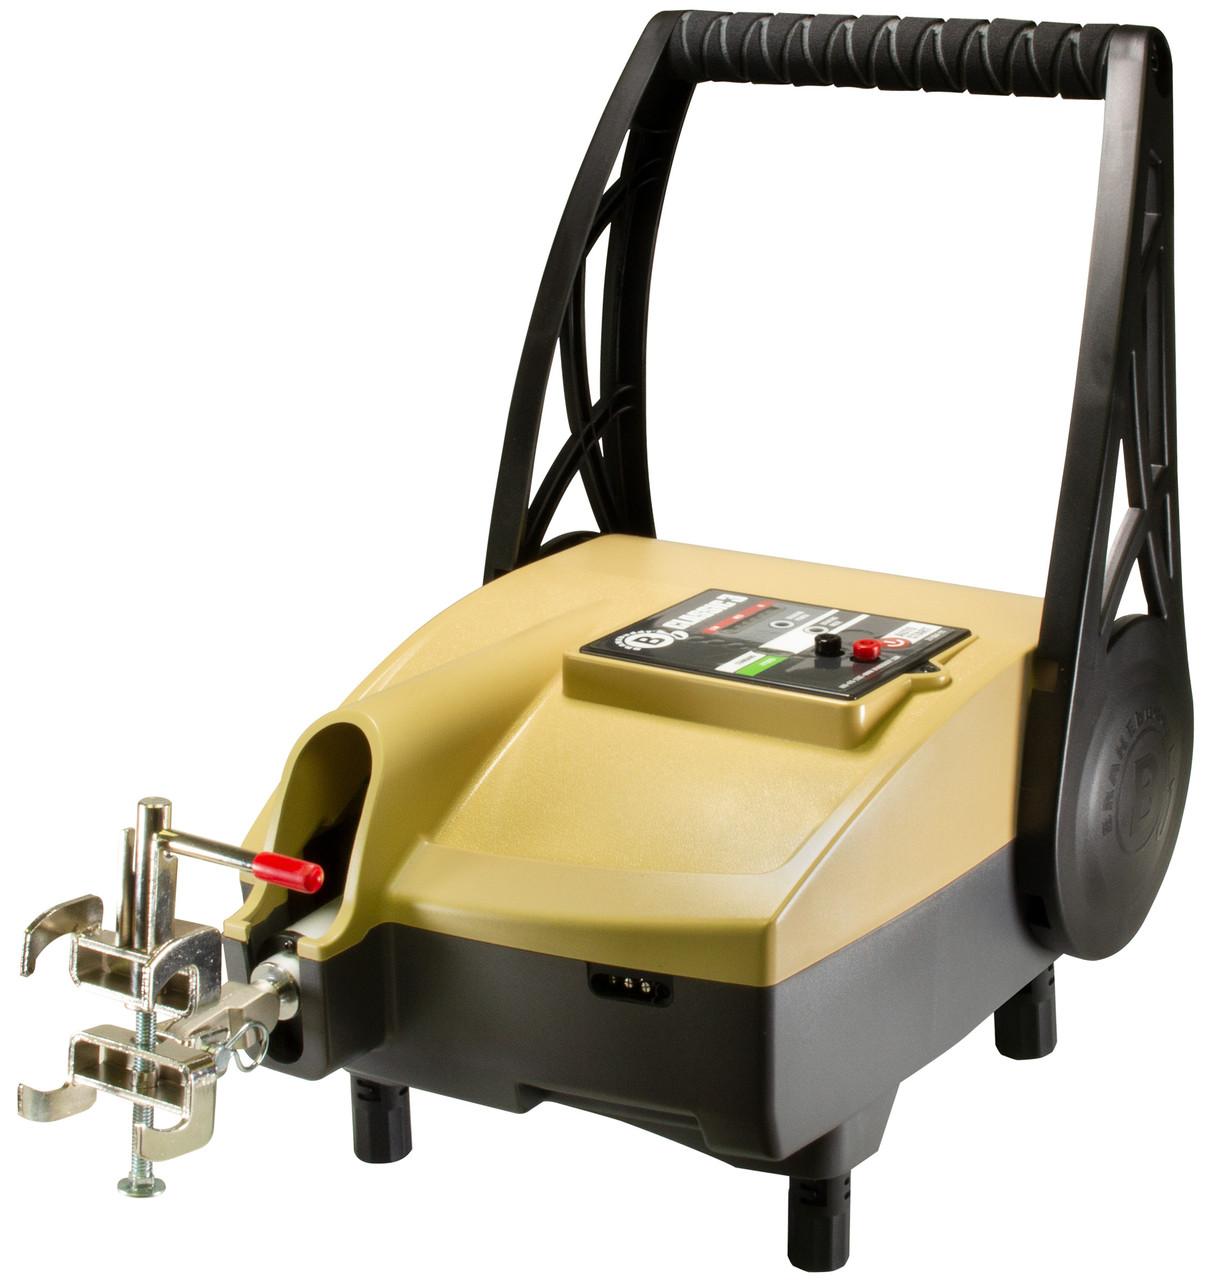 39494 --- BrakeBuddy Classic III™ Braking System